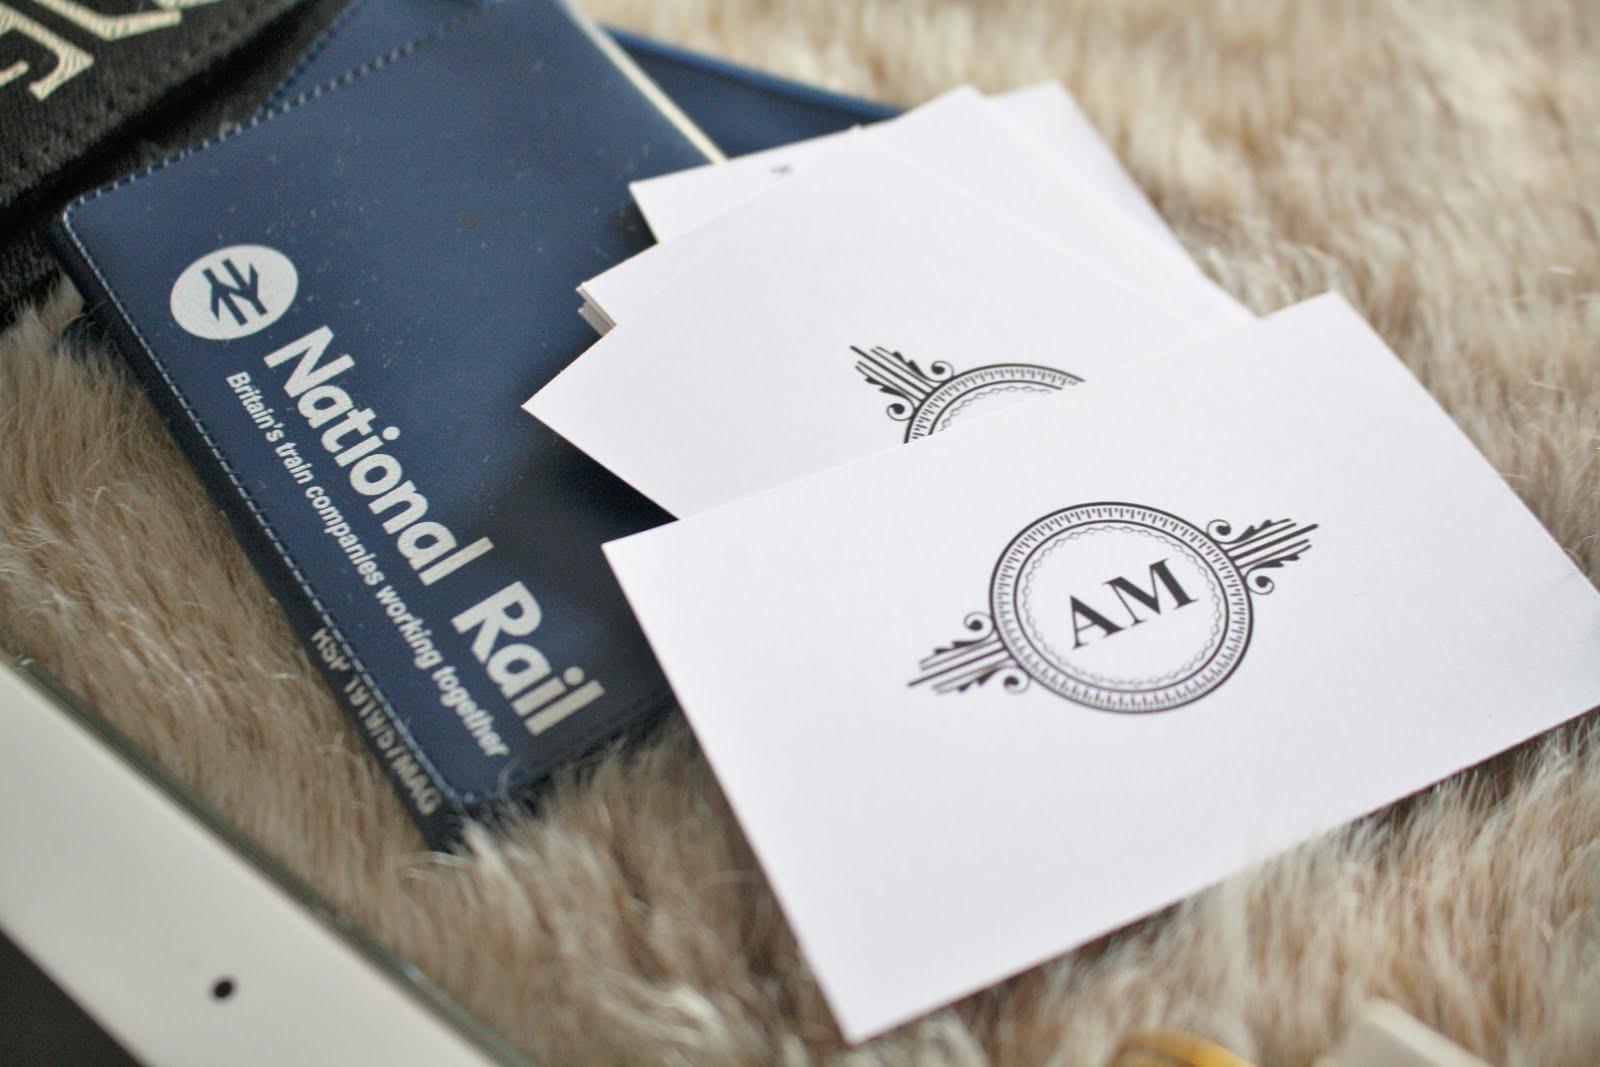 blogger essentials, flatlay, blogger event, london, travel essentials, travel kit, emma bridgewater, national rail, business cards, ideas, card holder, travel holder